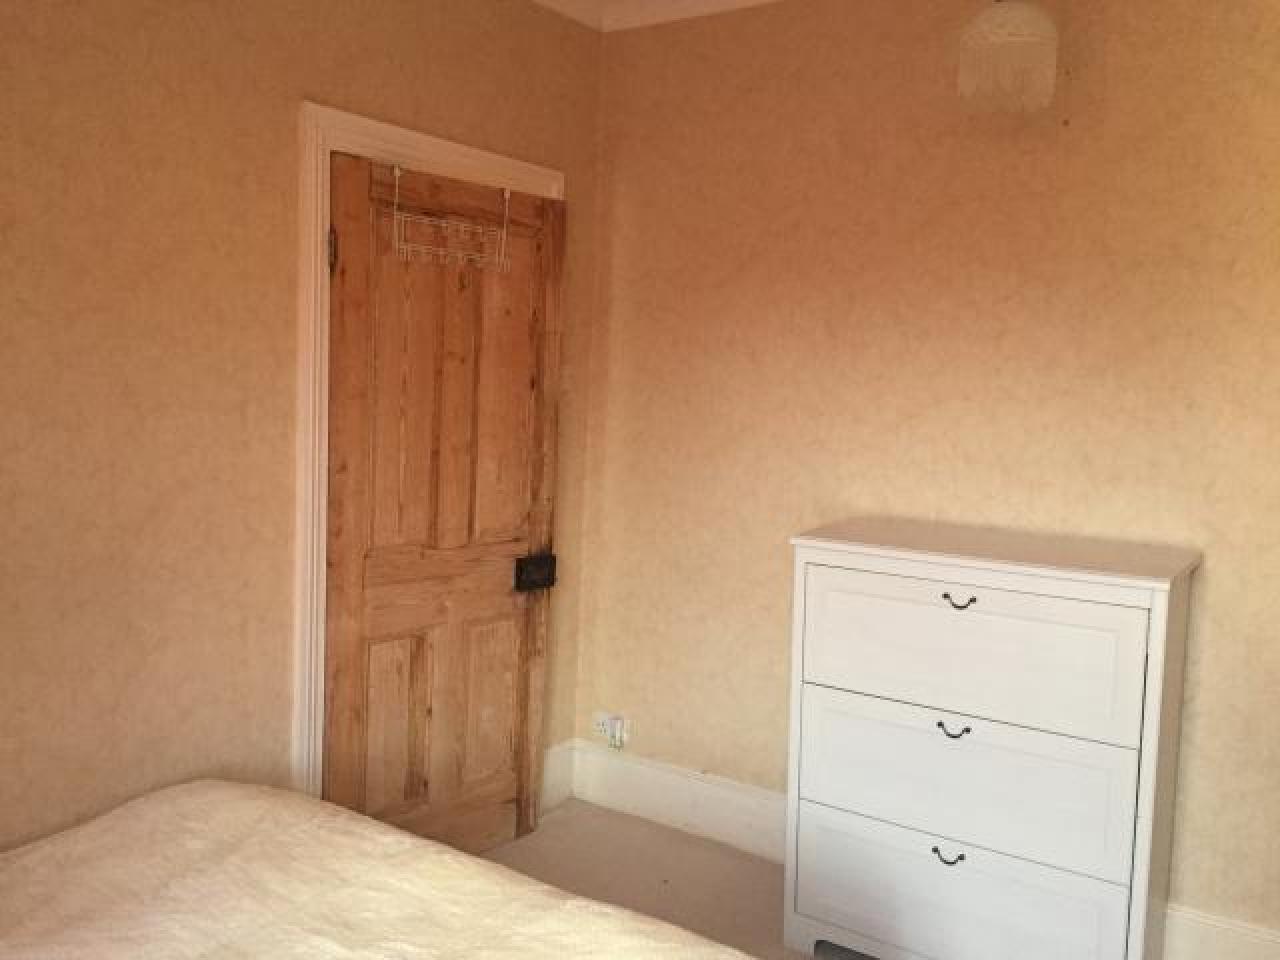 Дабл комната для одного человека - 3